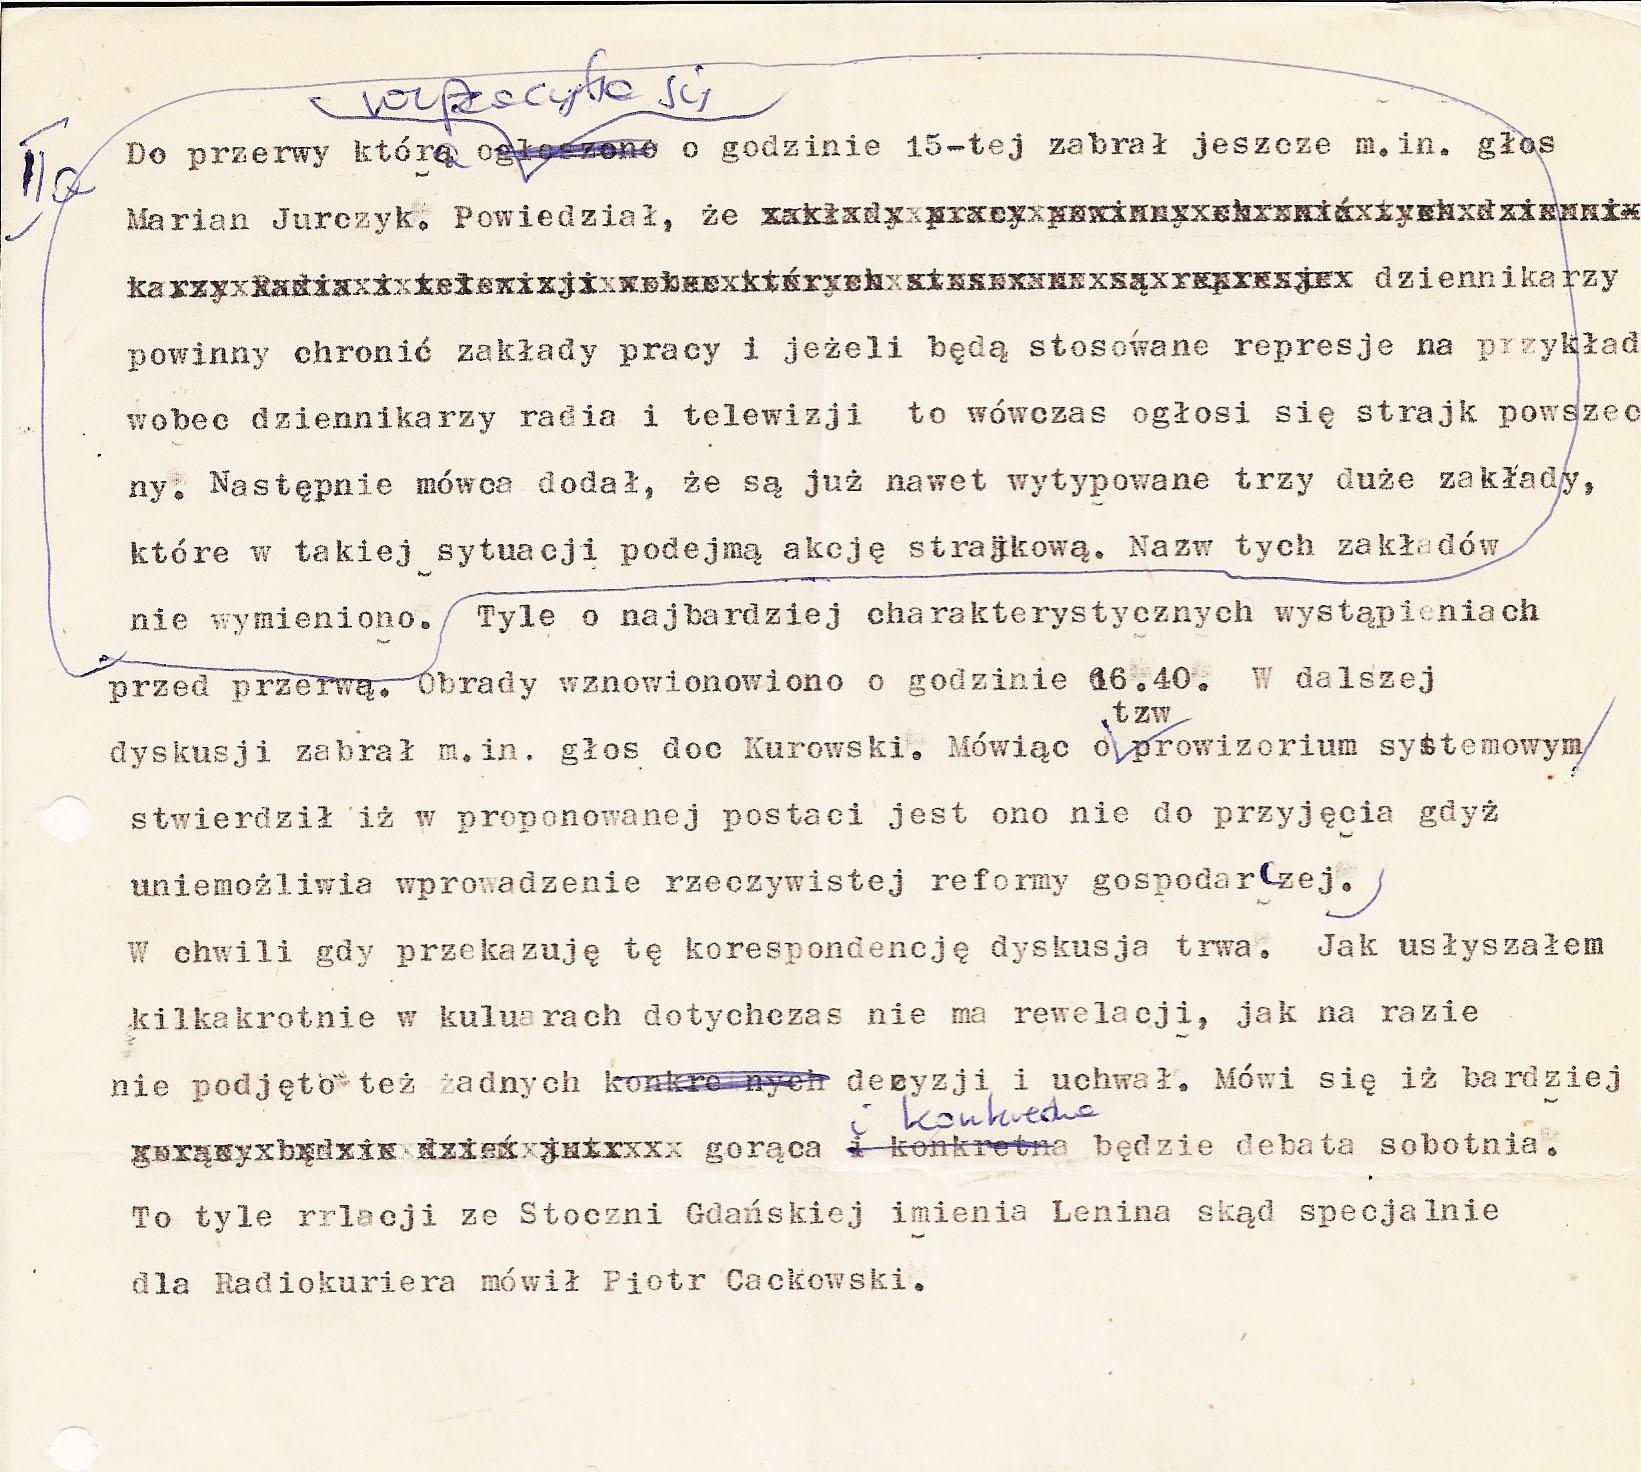 Radiokurier 12.12.1981 r. 2